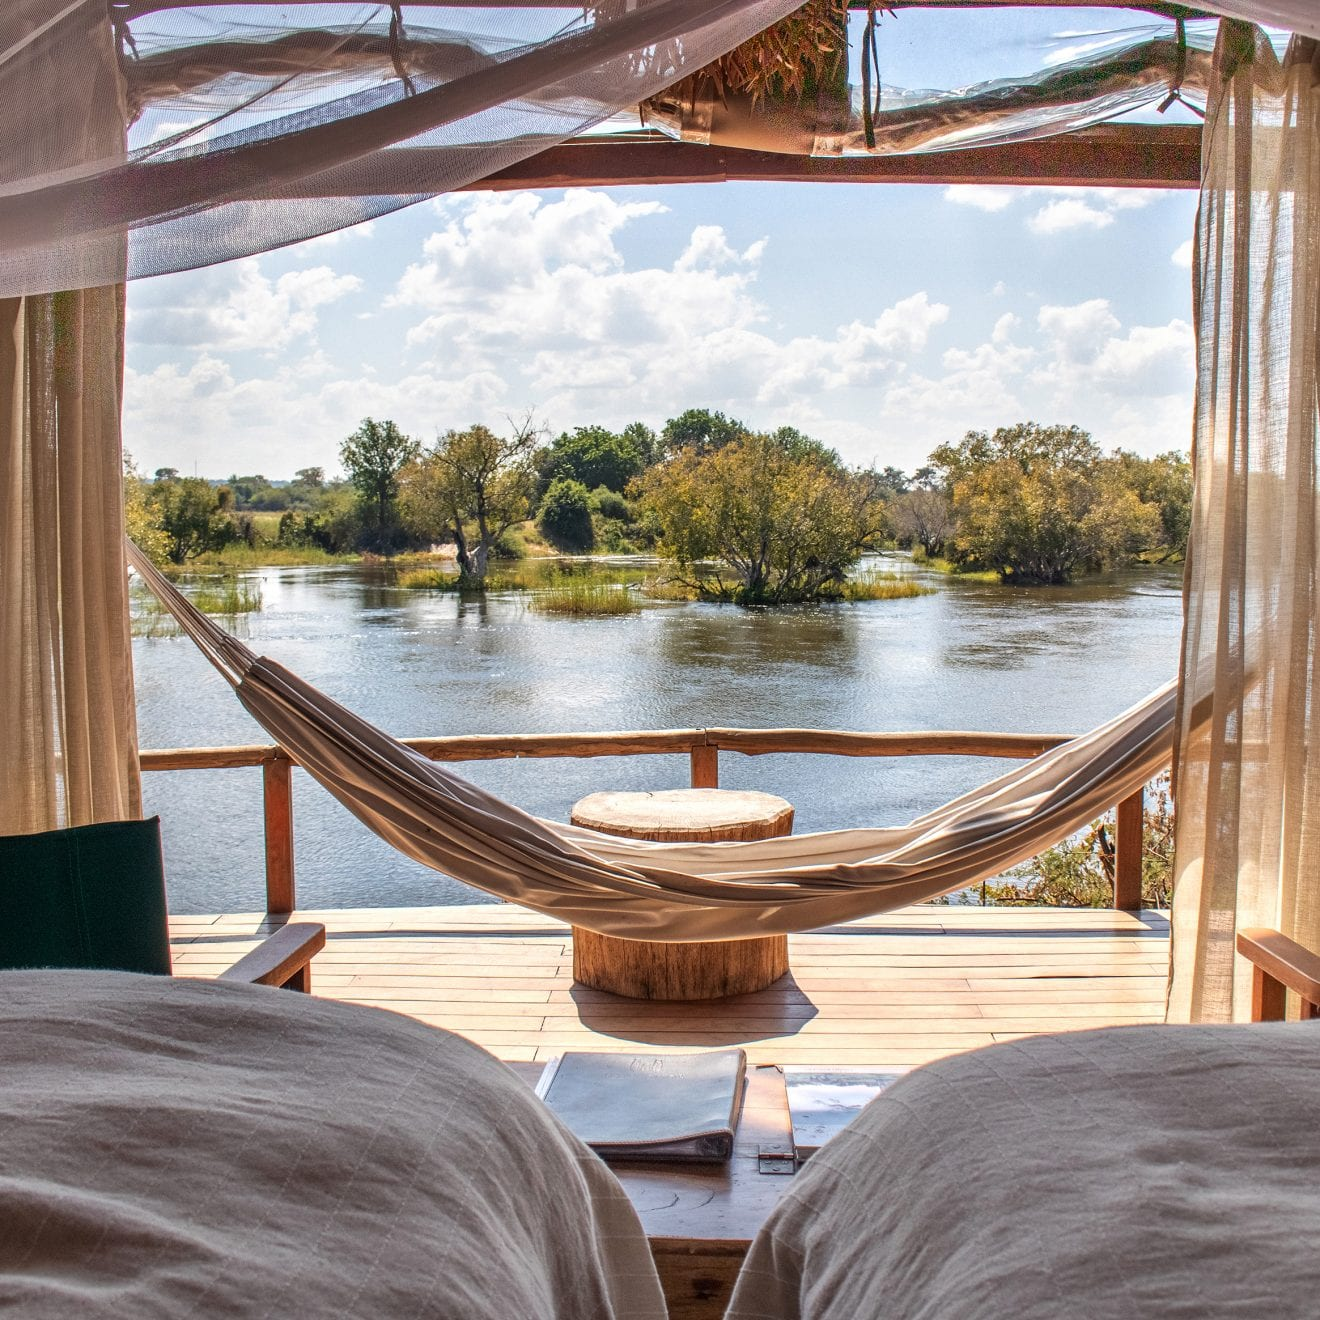 a bedroom patio overlooking the Zambezi River